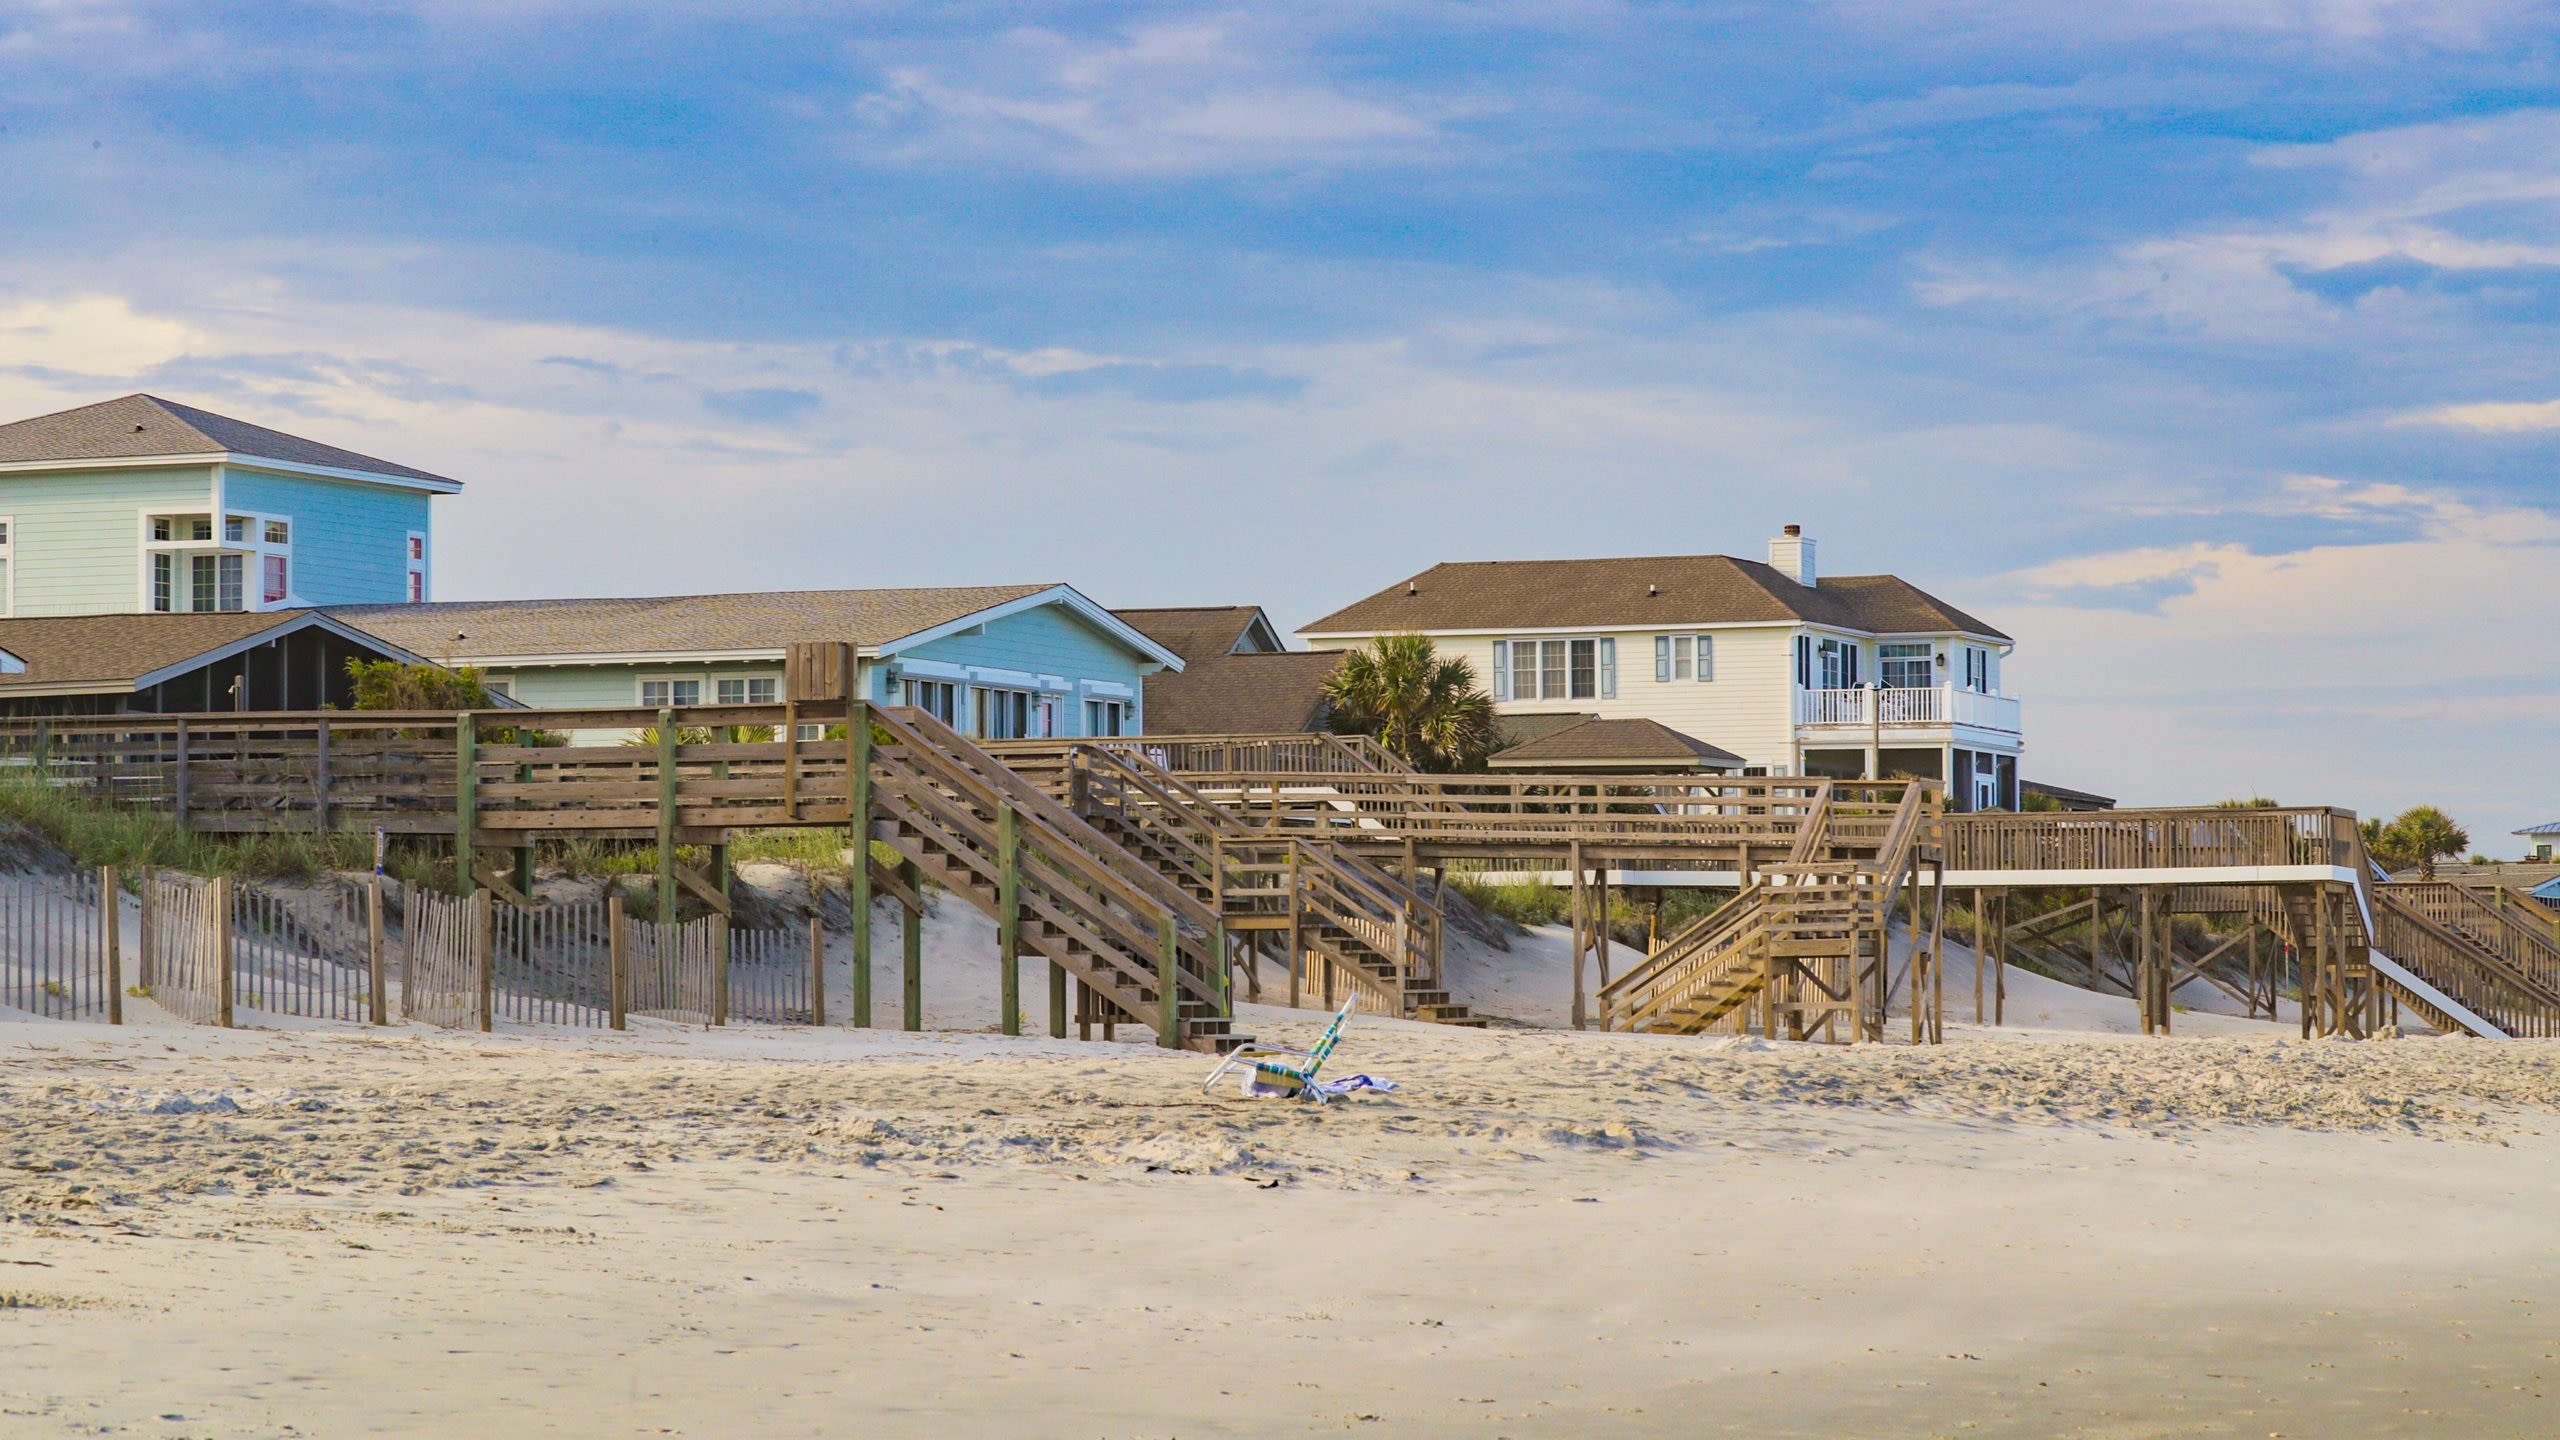 Litchfield Beach, Pawleys Island, South Carolina, United States of America